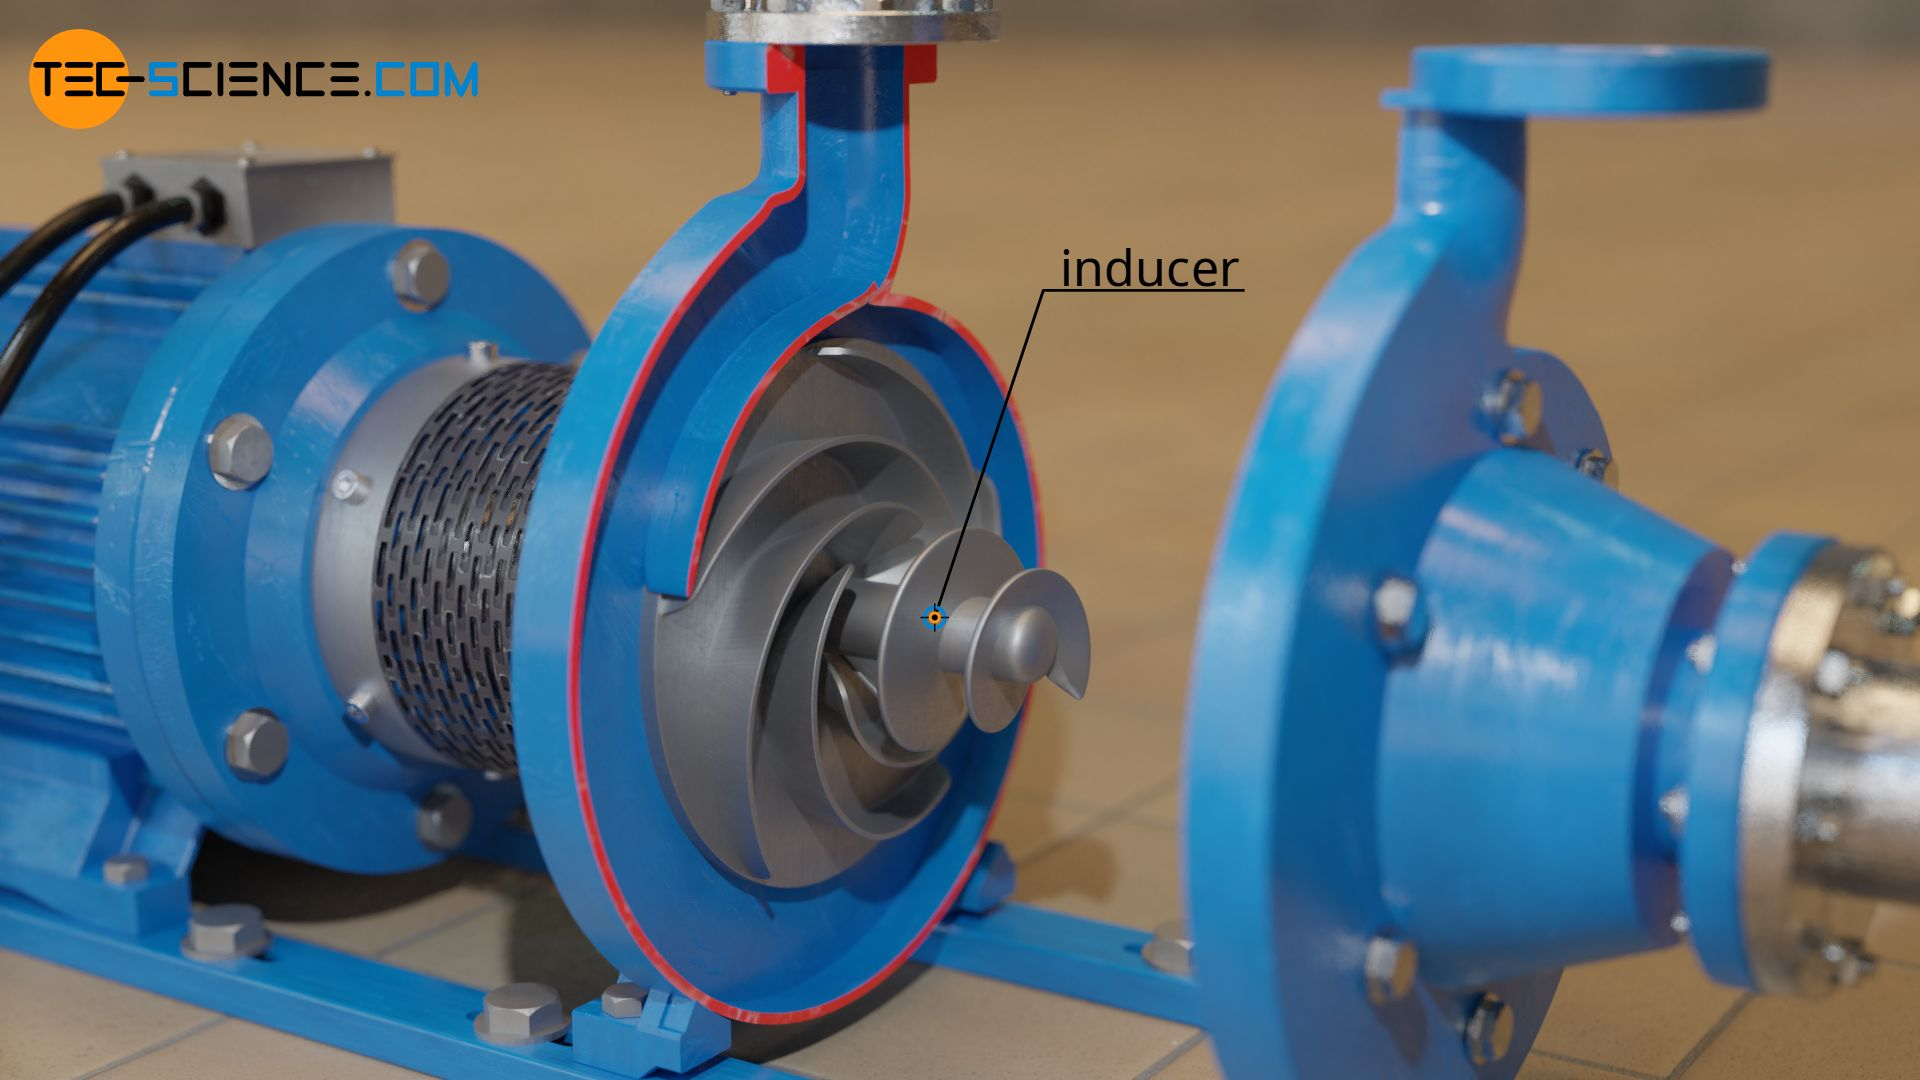 Inducer of a centrifugal pump